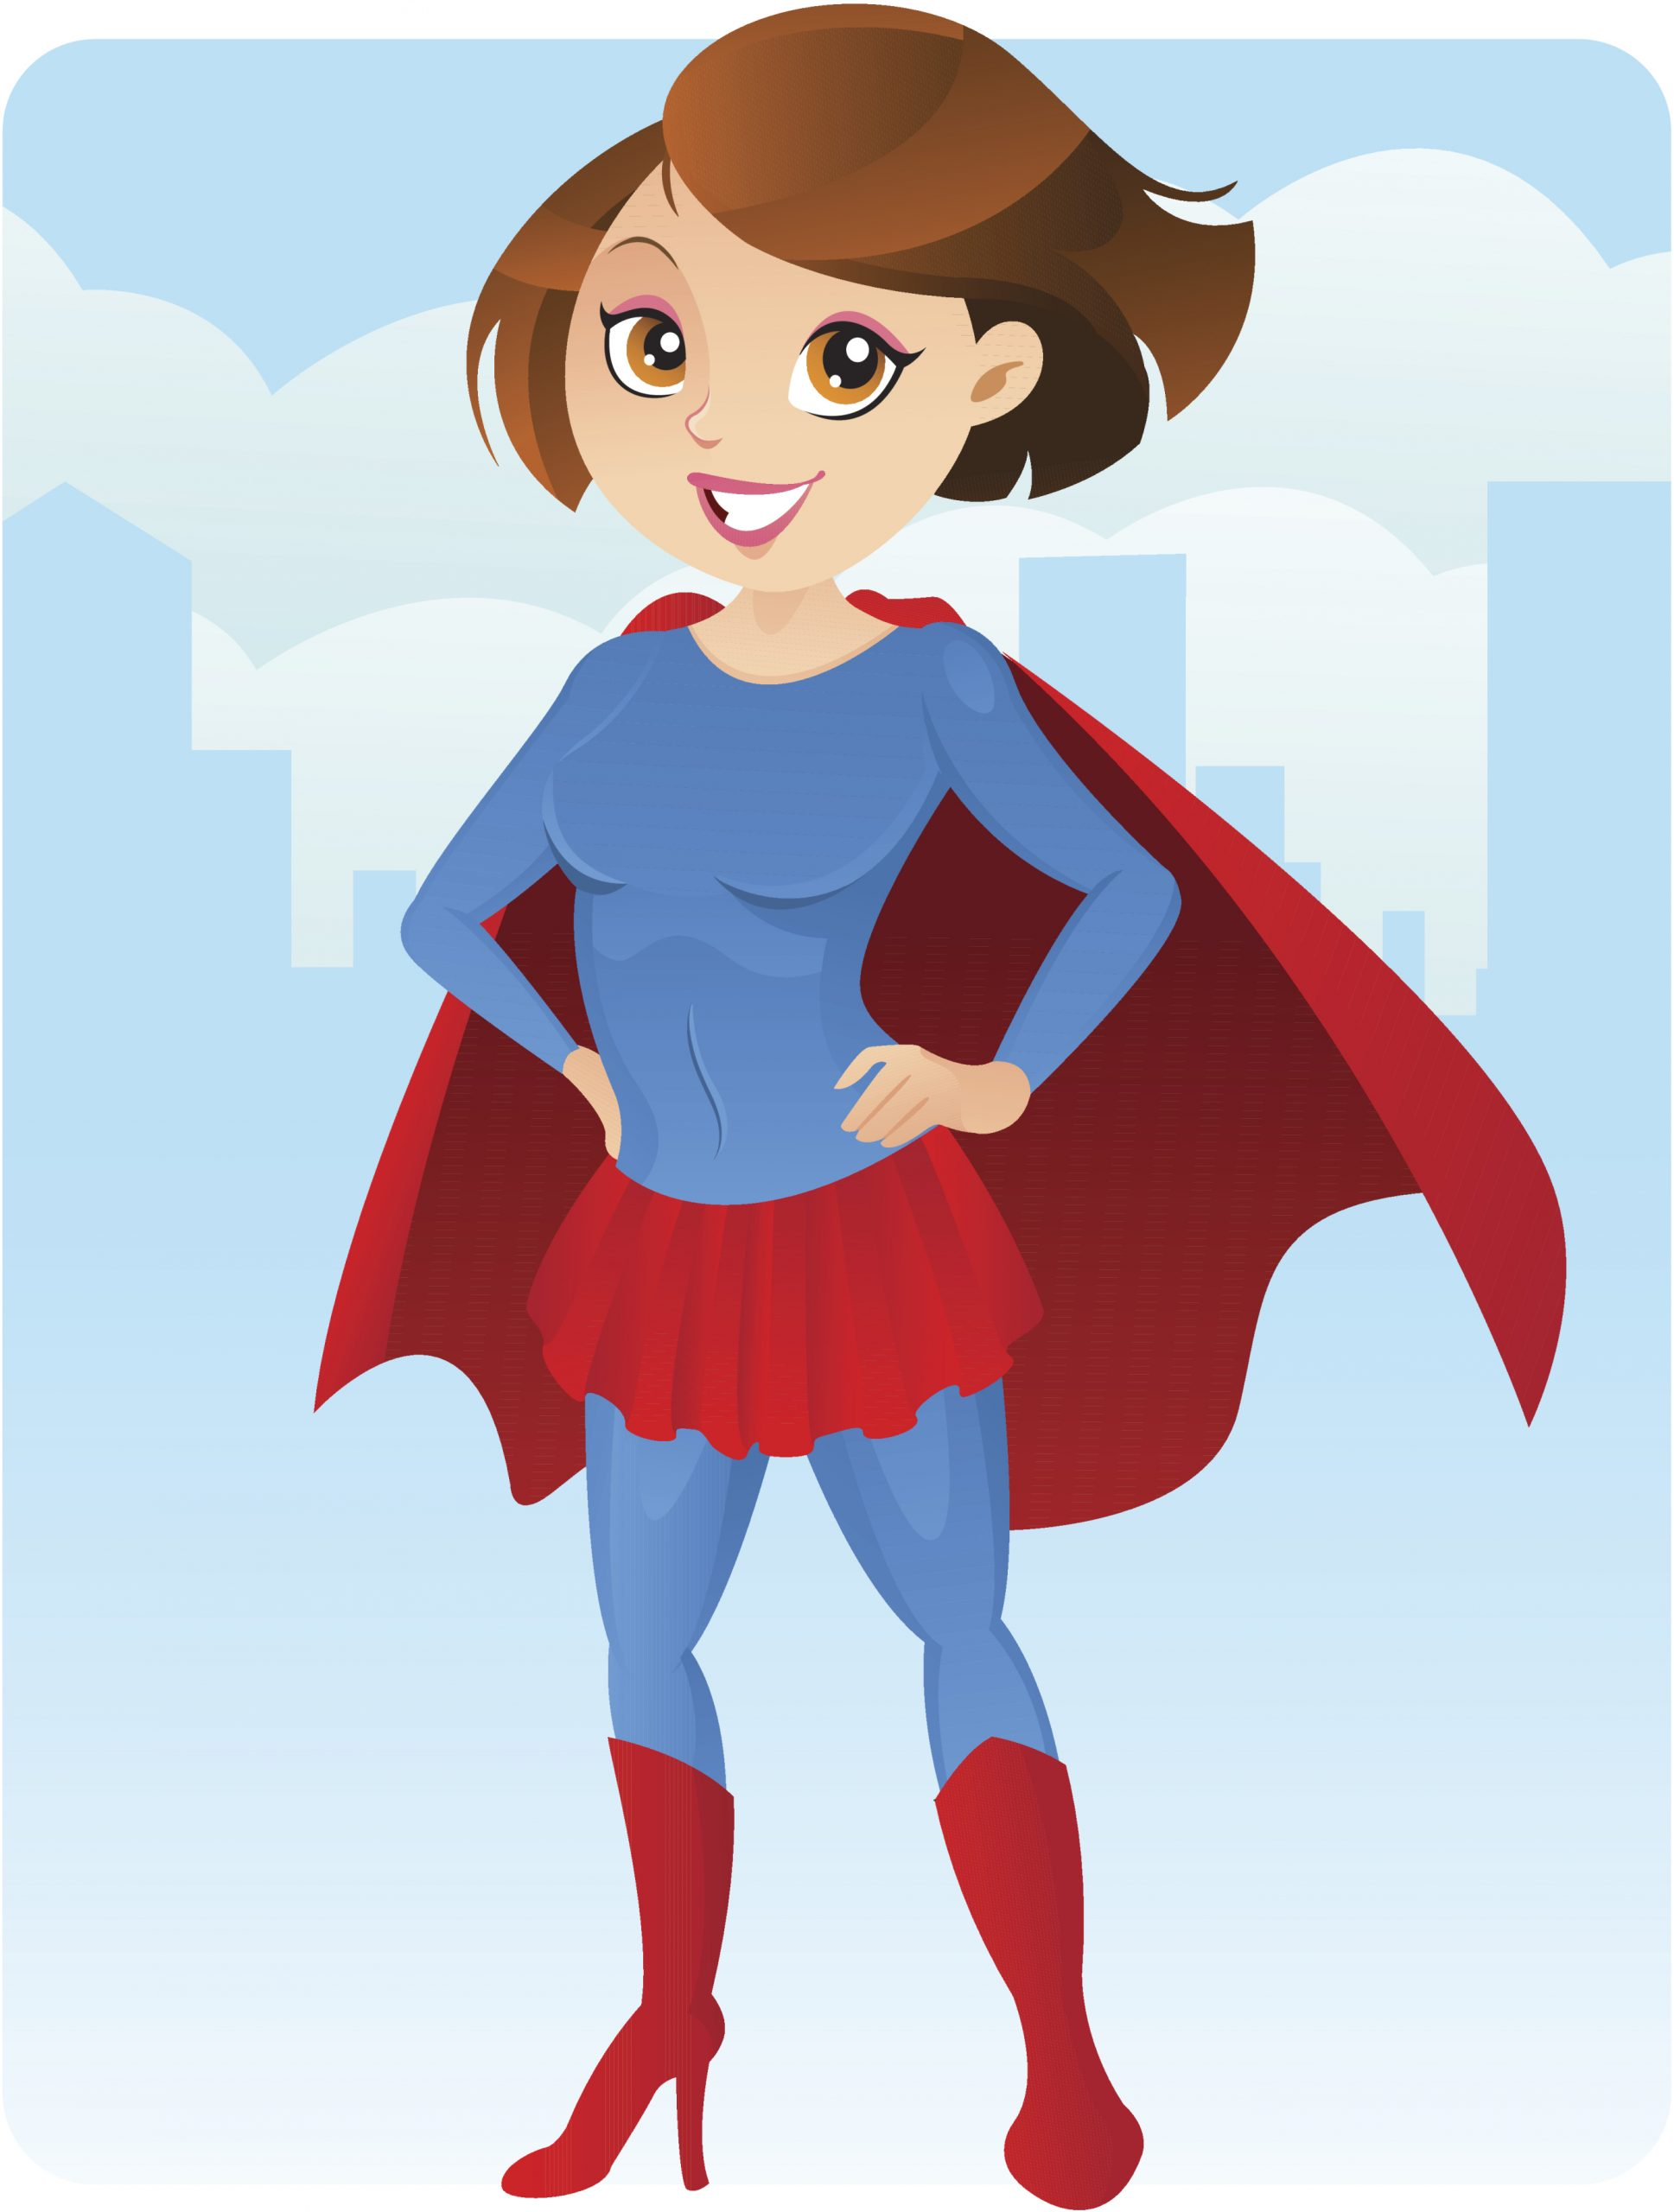 Tomorrow Girl - My Personal Superhero